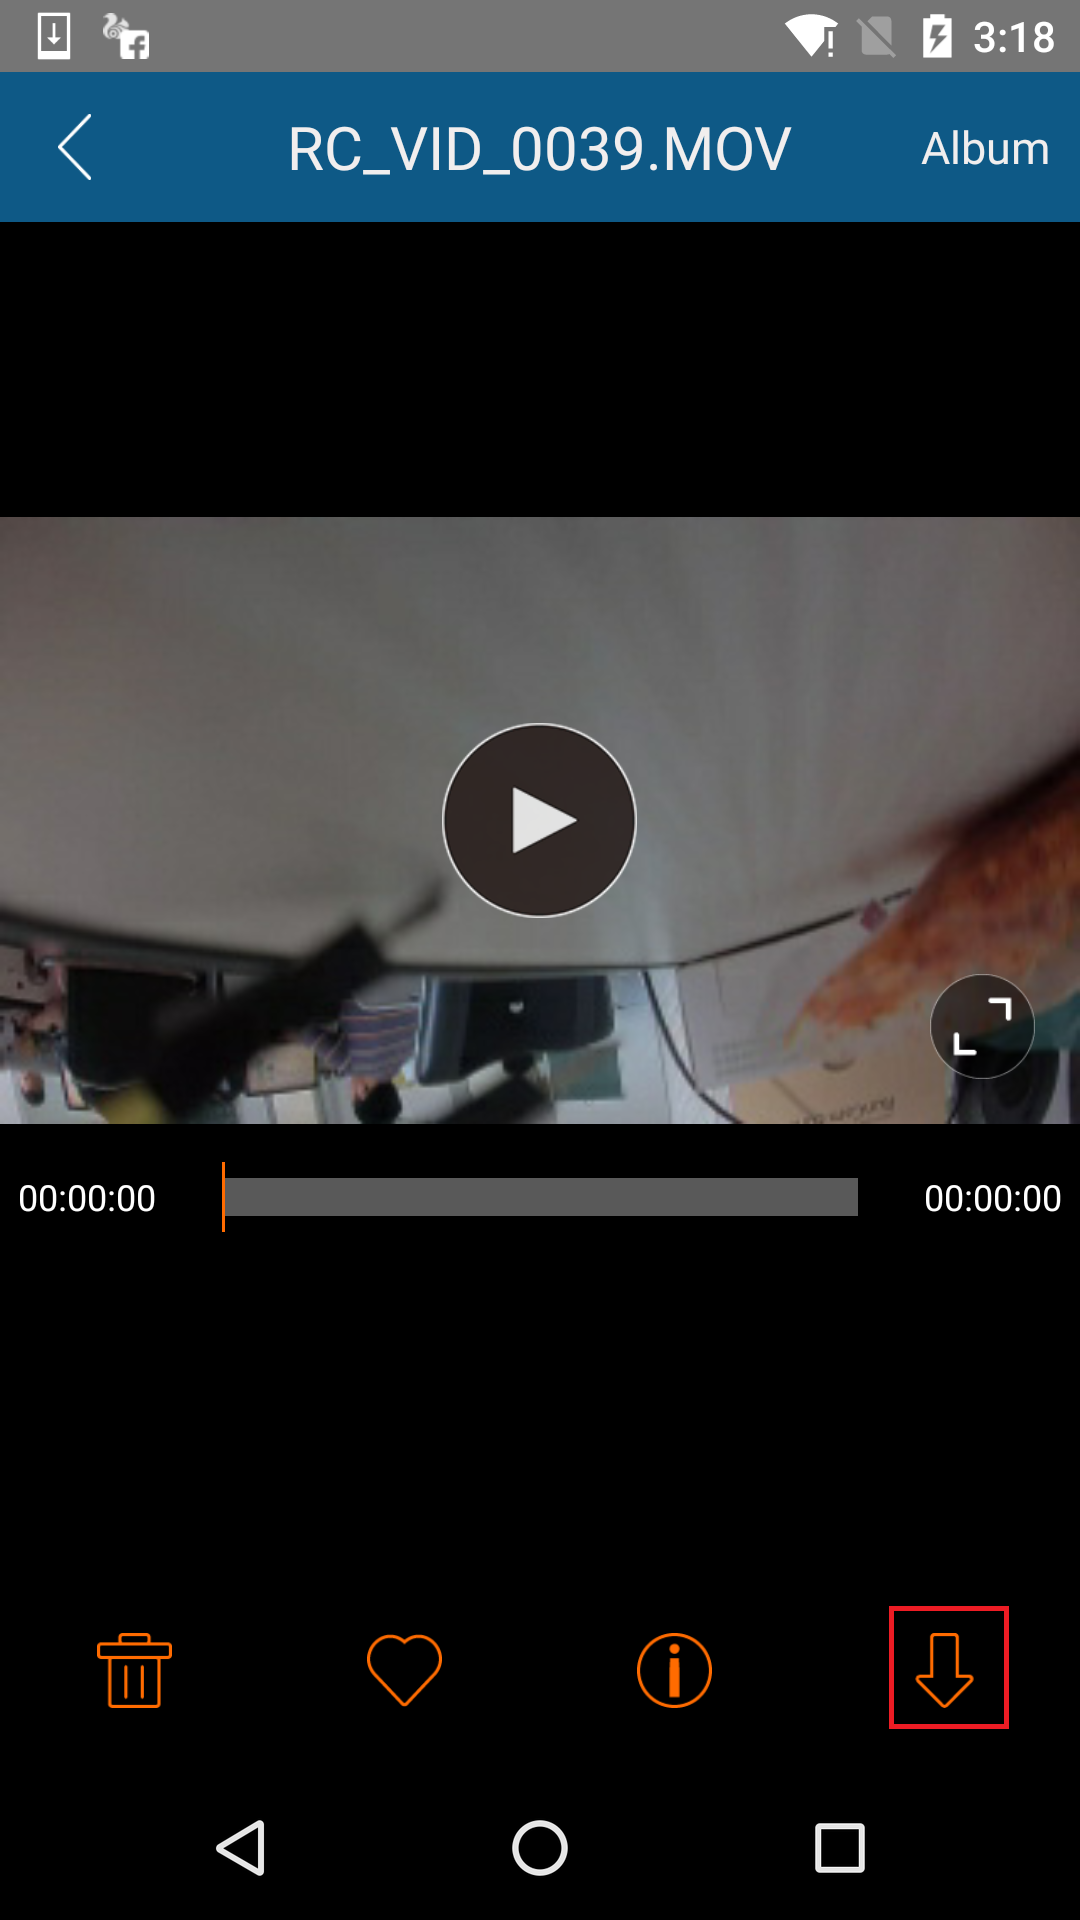 How to download video files via App? – RunCam Help Center